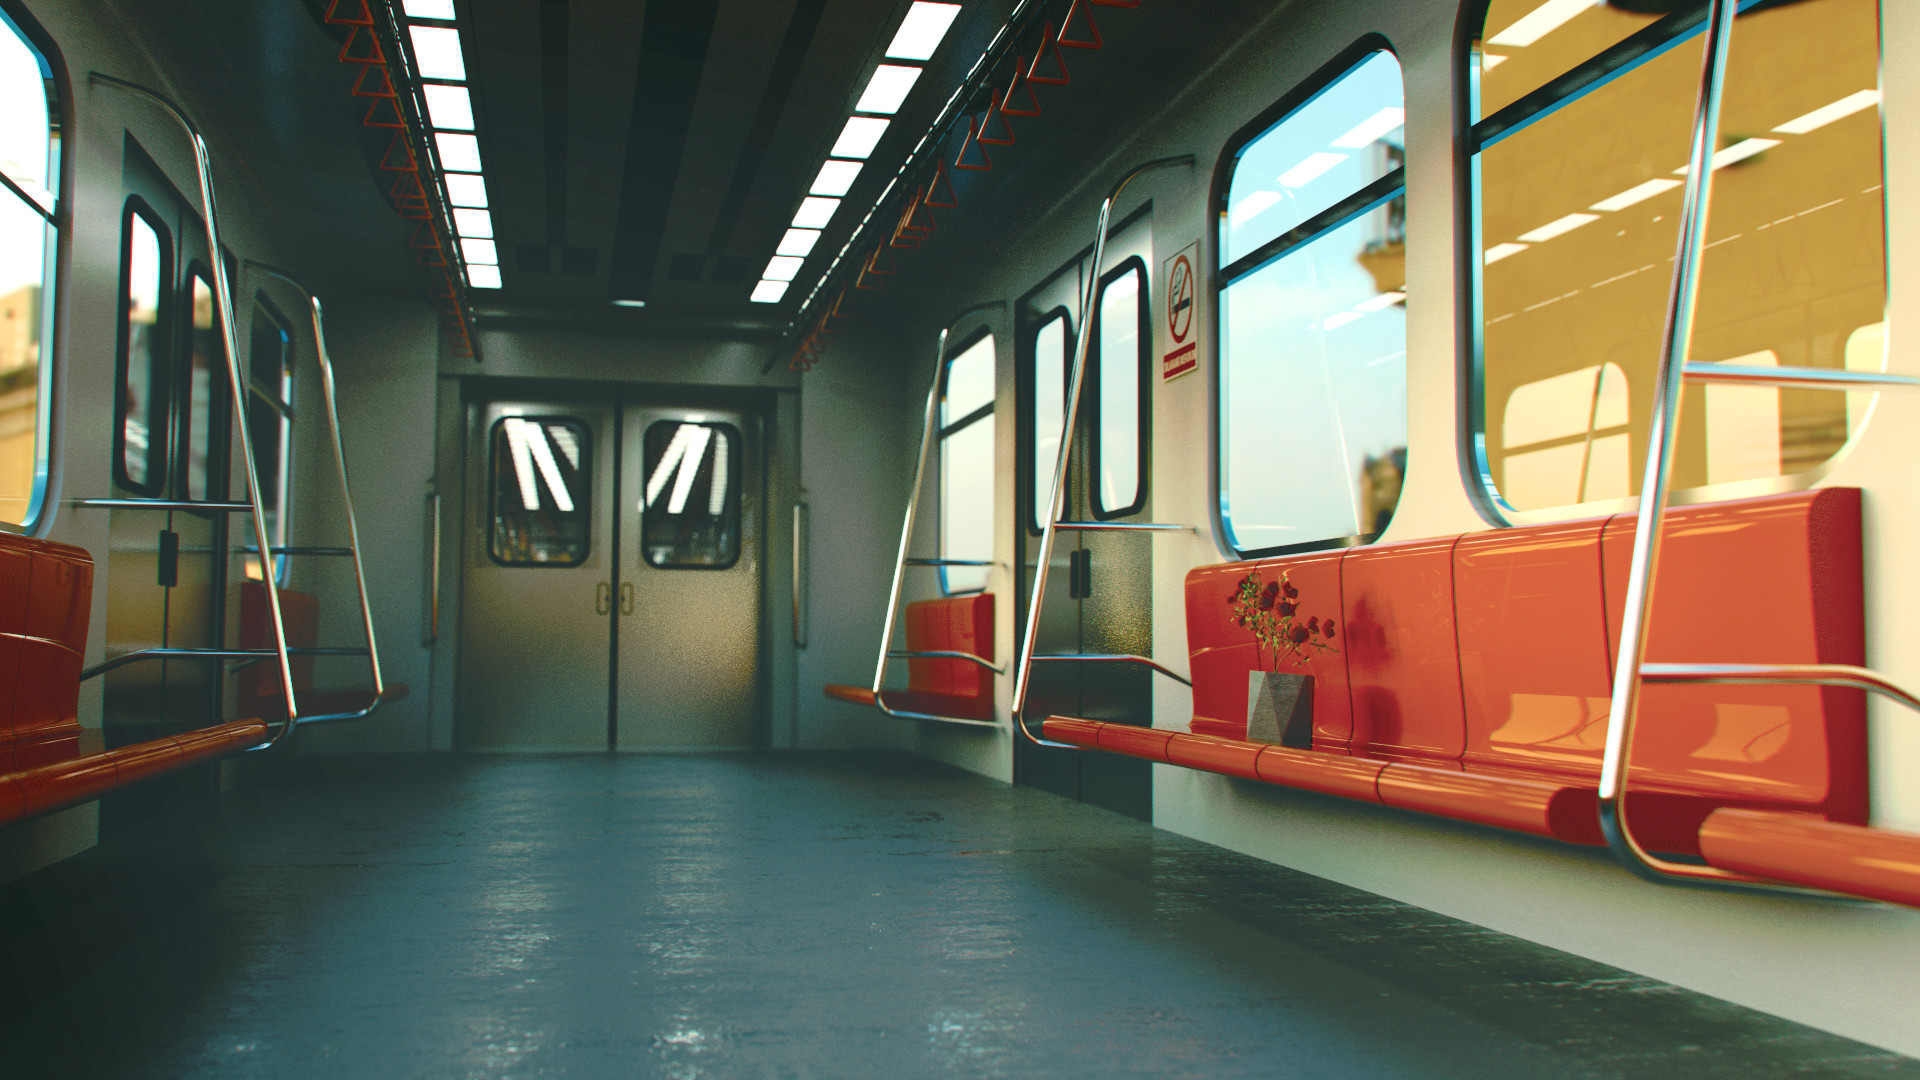 Syaf fiq train 2 post